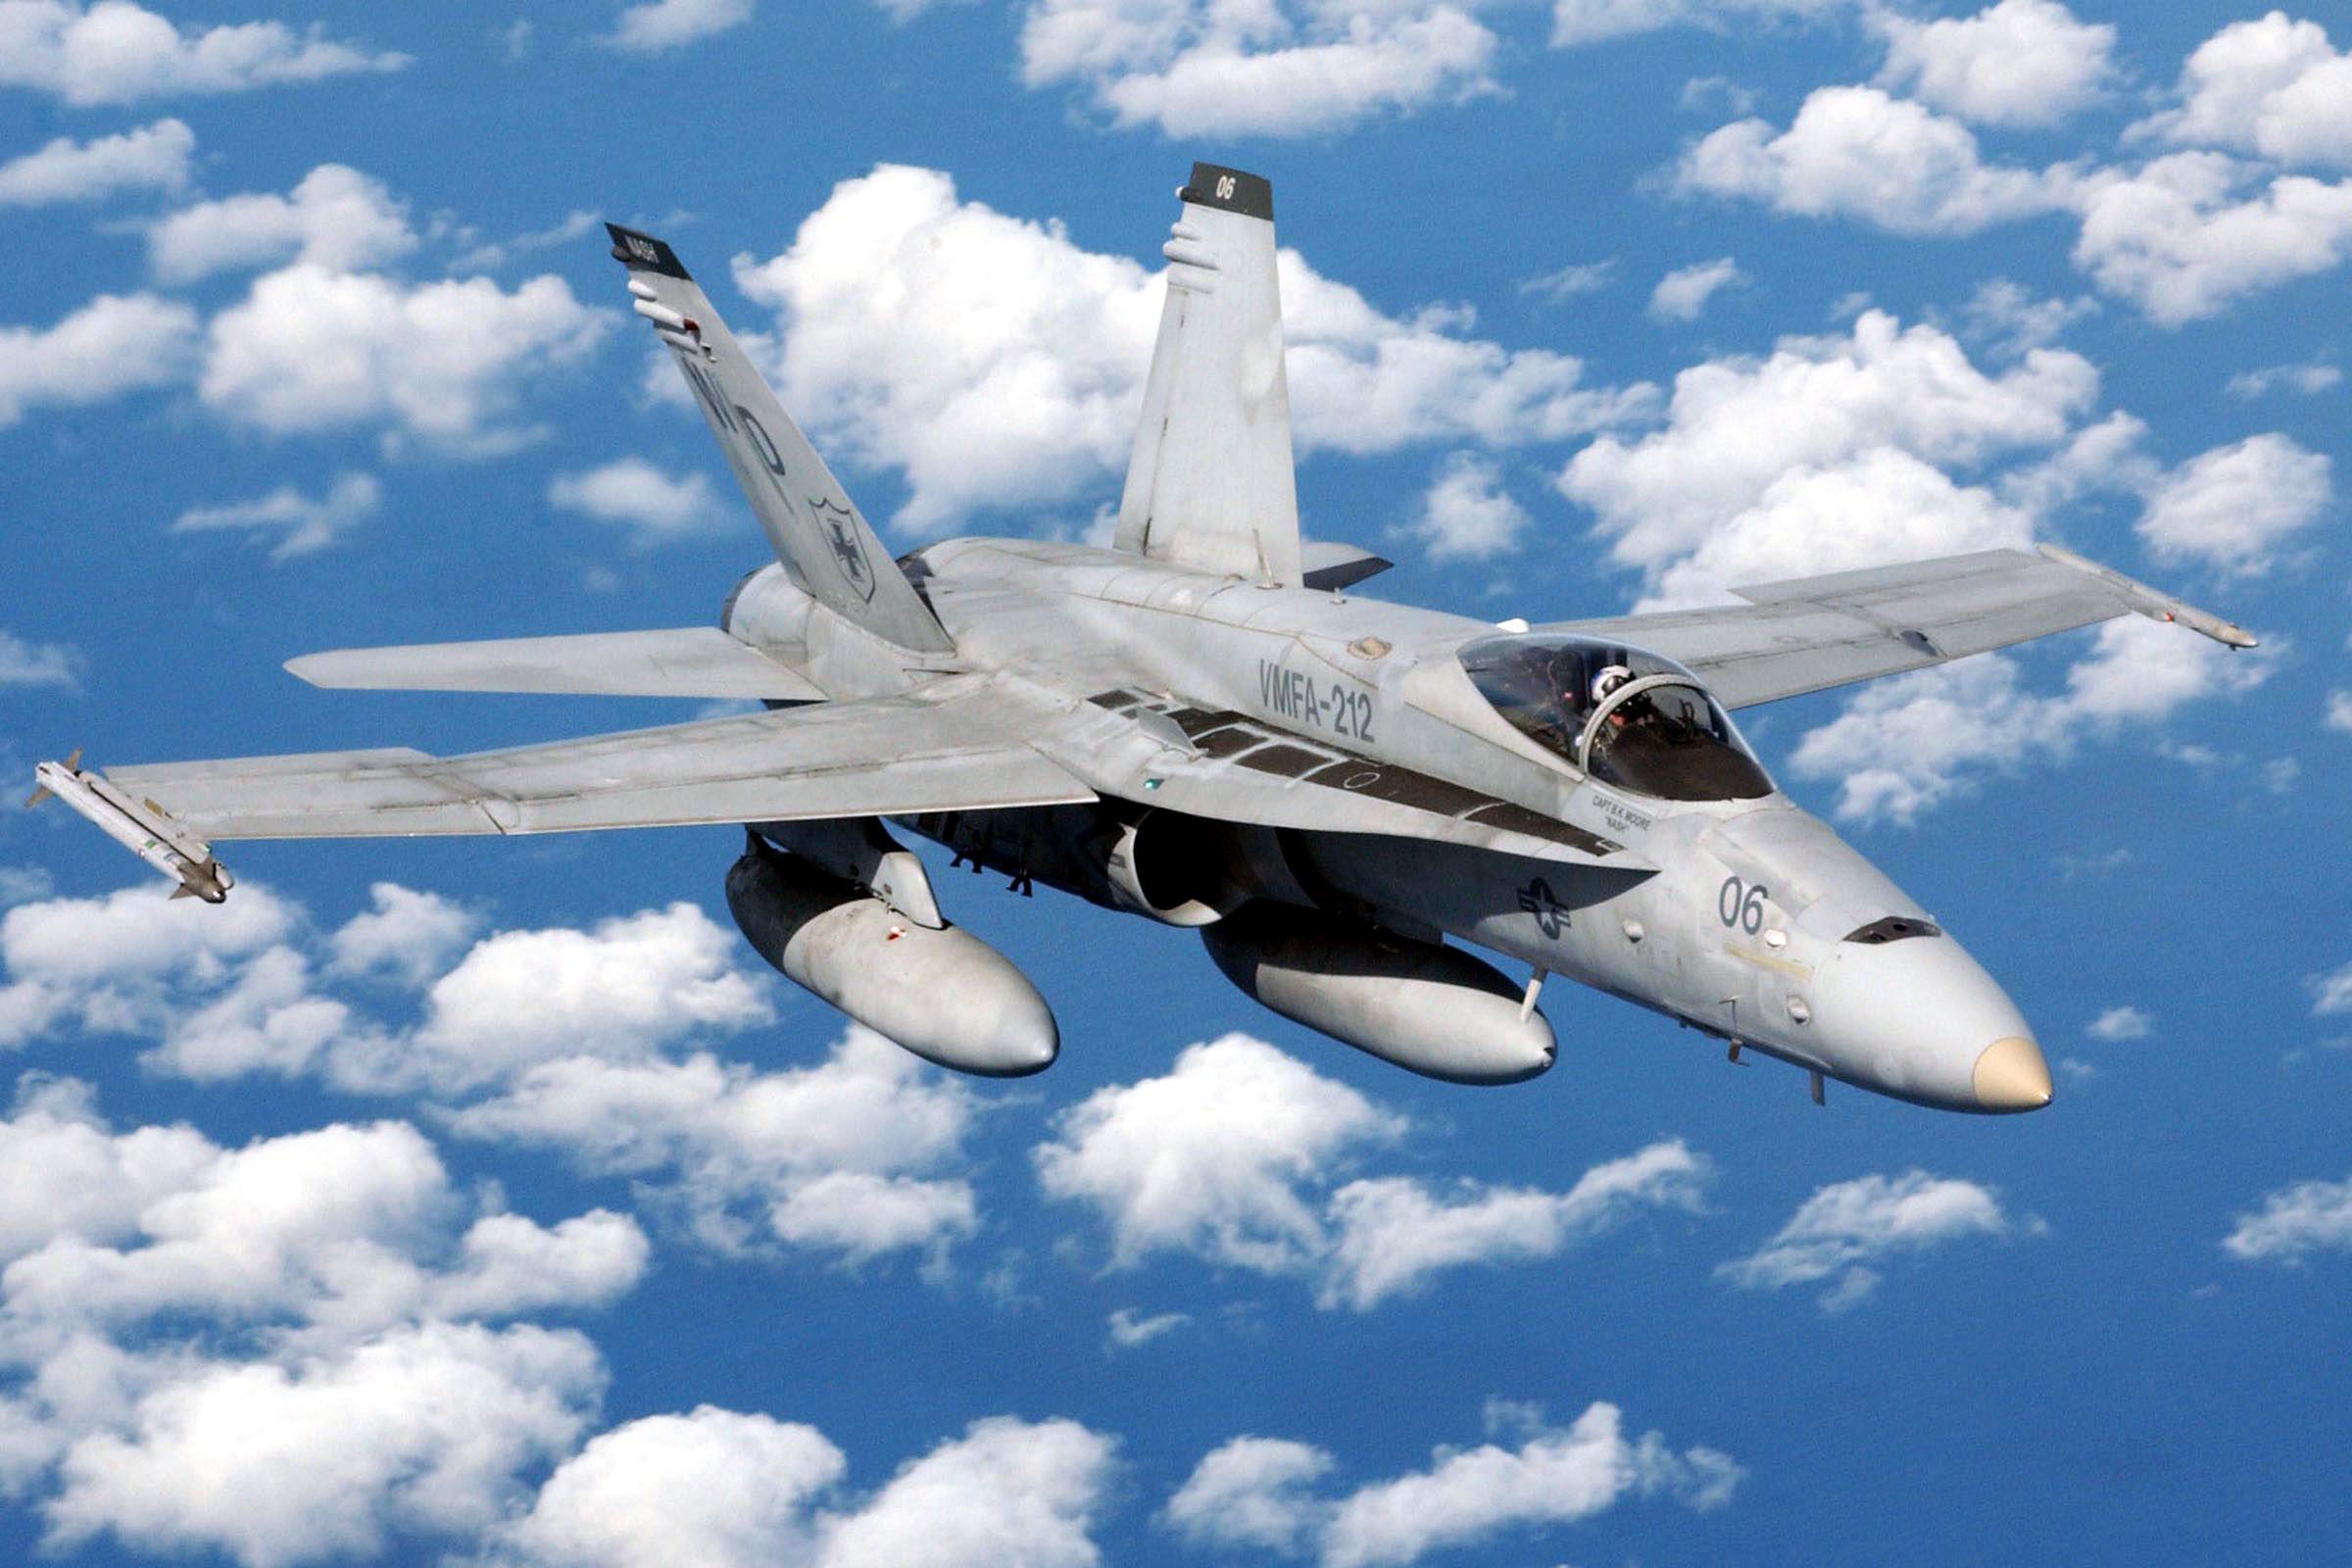 18 Hornet Wallpaper 2400x1600 F18 Hornet 2400x1600